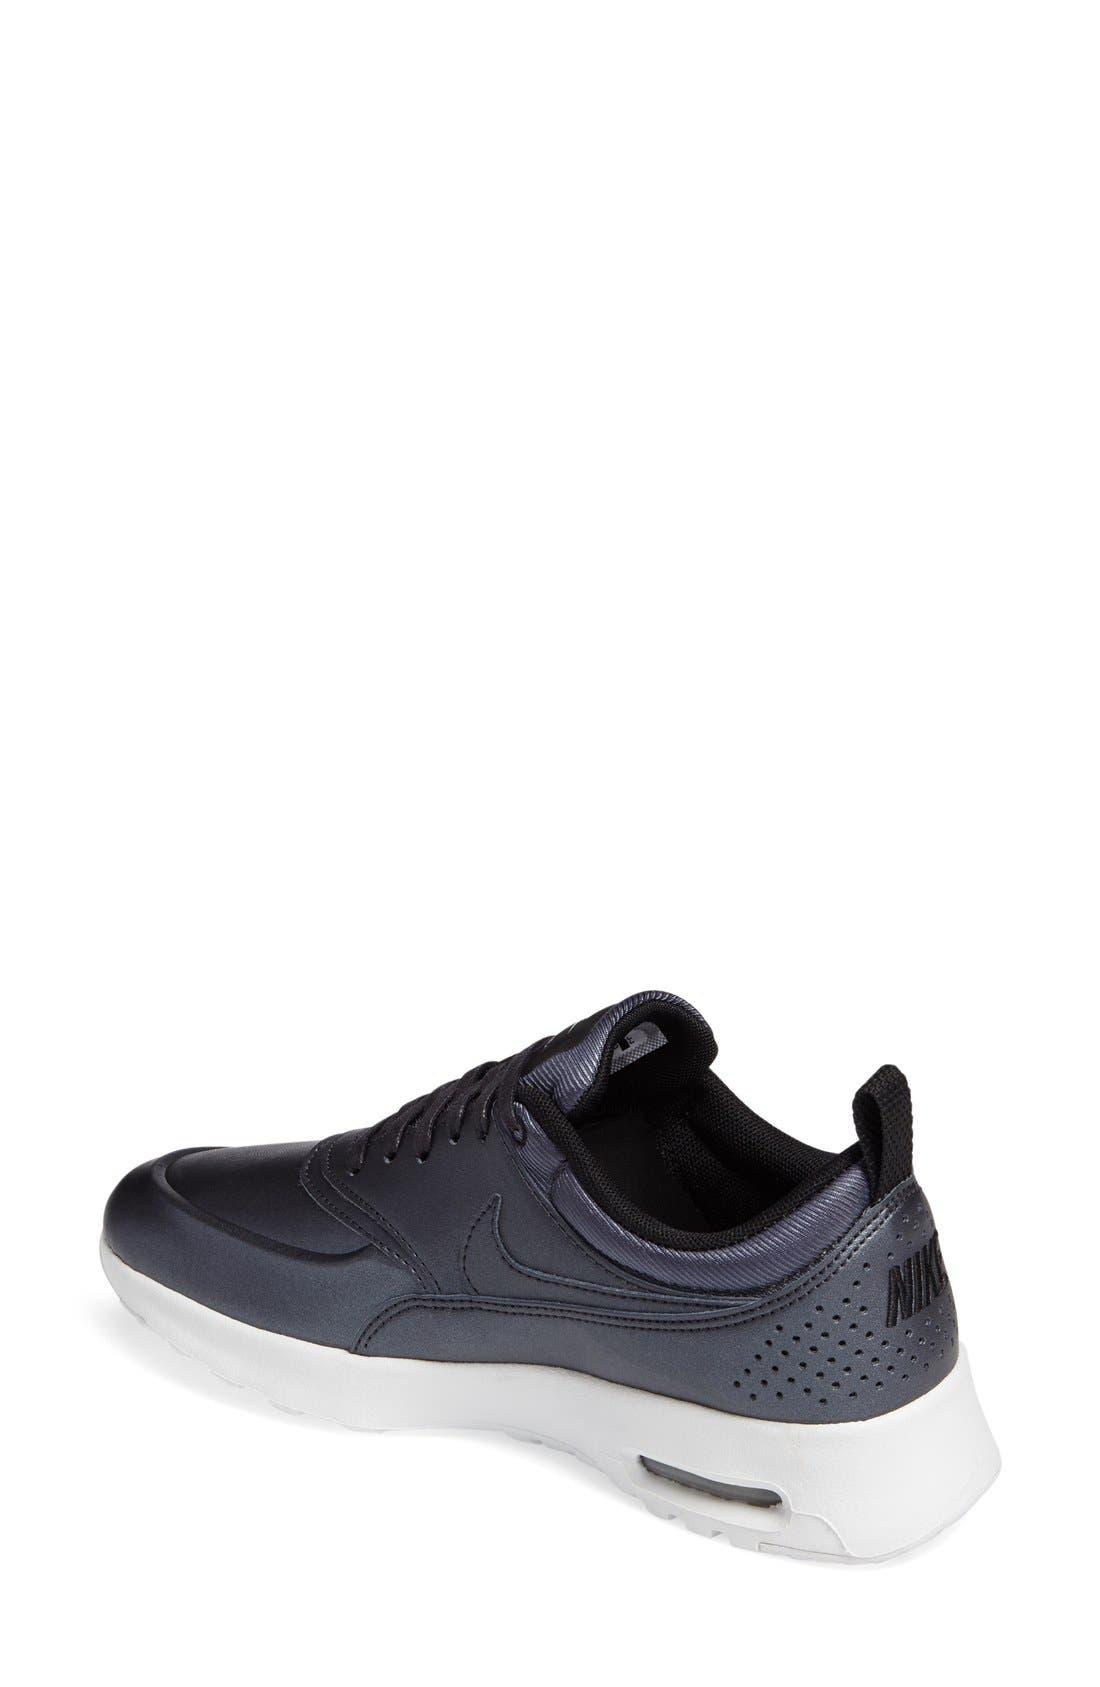 Air Max Thea SE Sneaker,                             Alternate thumbnail 4, color,                             002